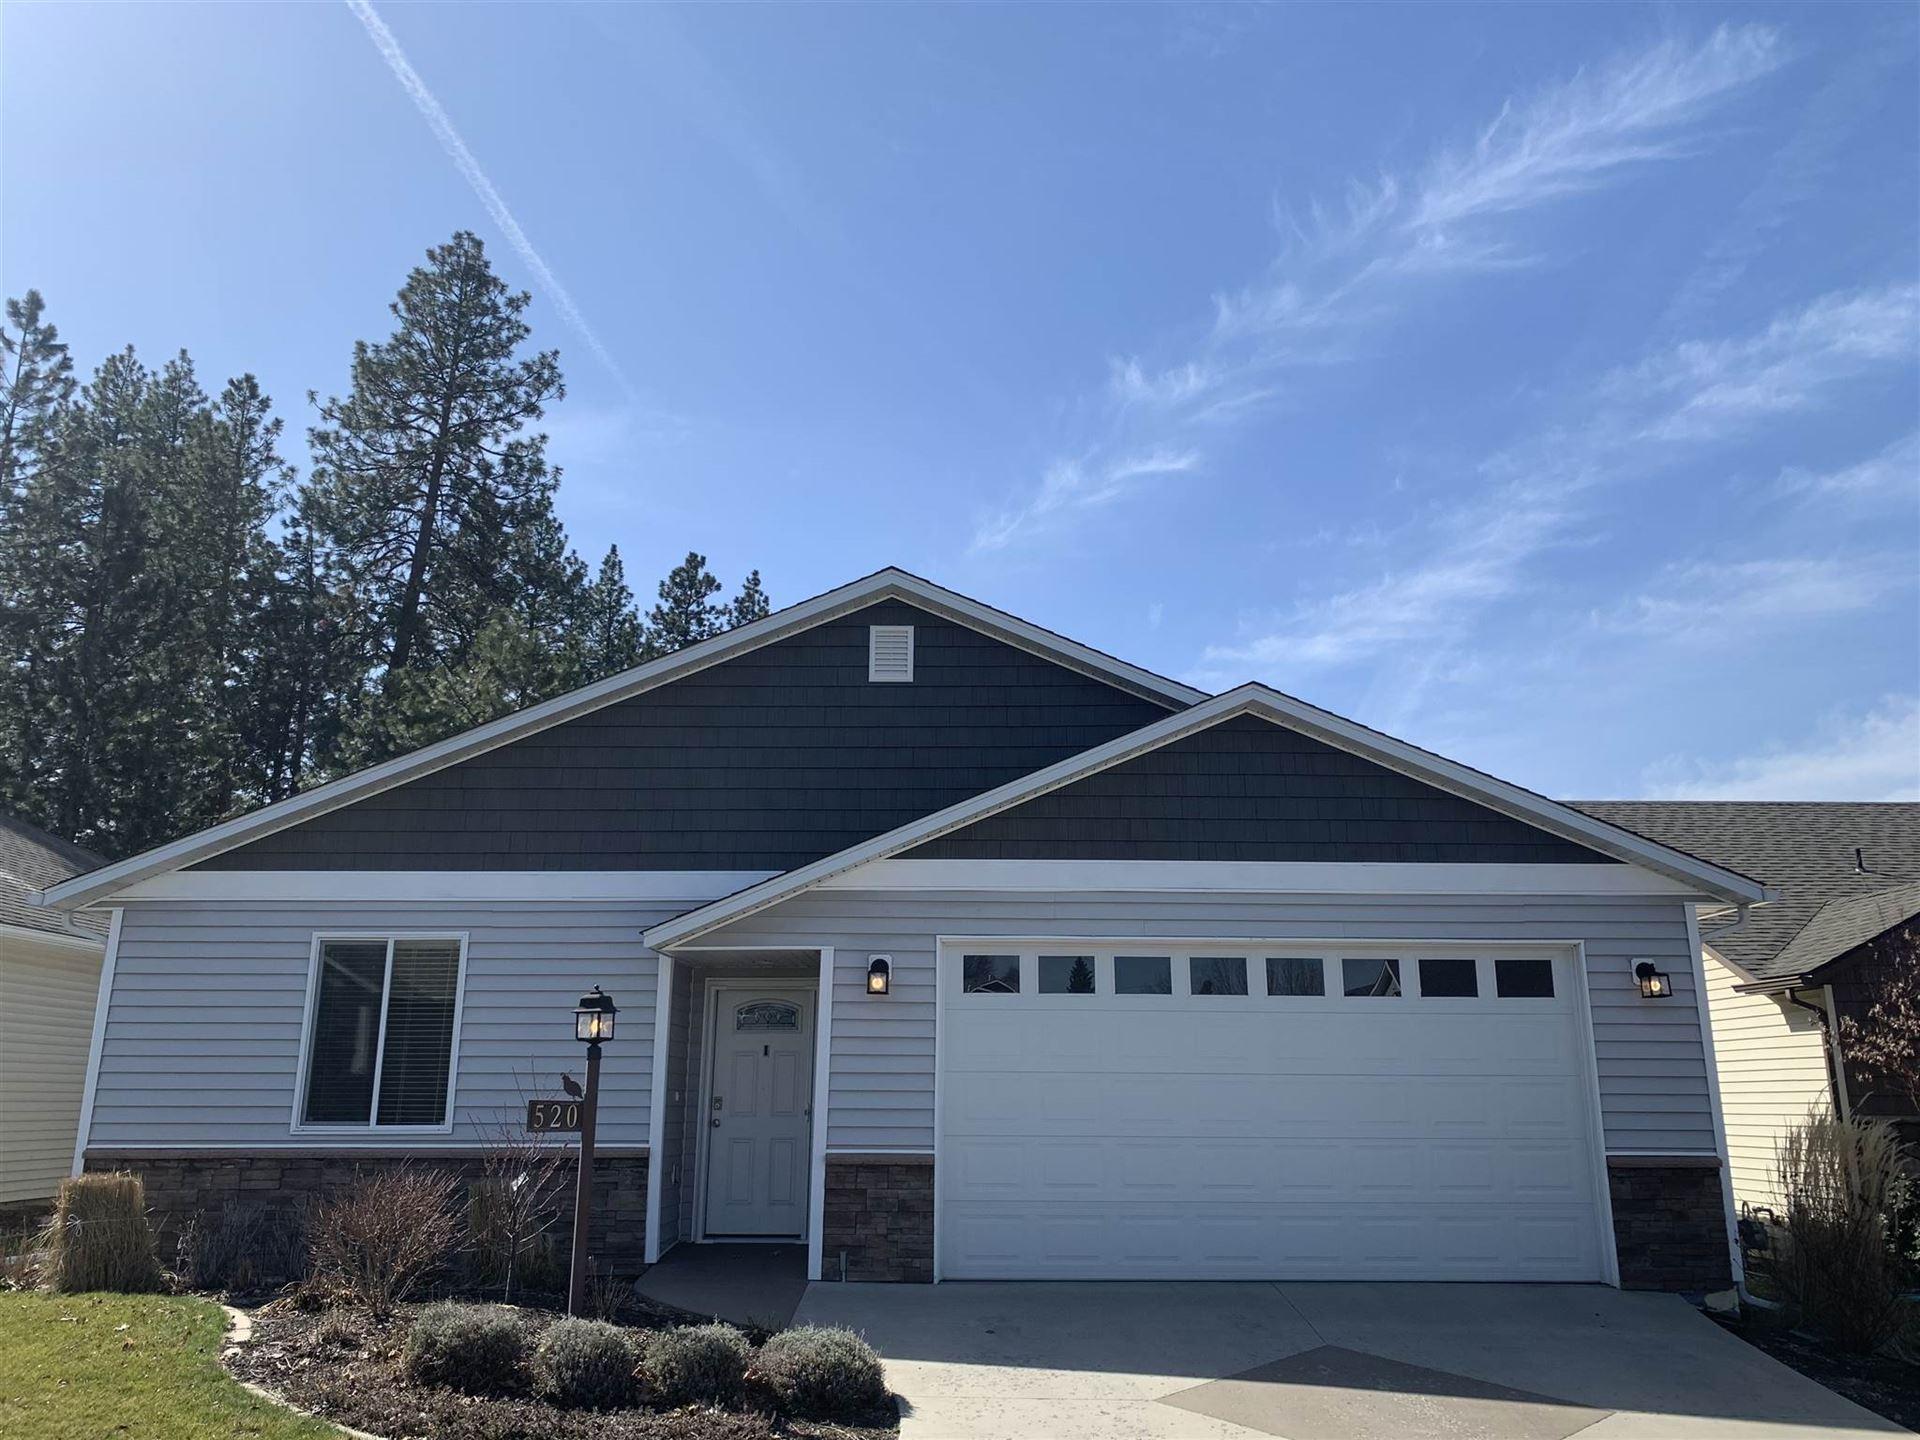 520 S Dartmouth Ln, Spokane Valley, WA 99206 - #: 202113550